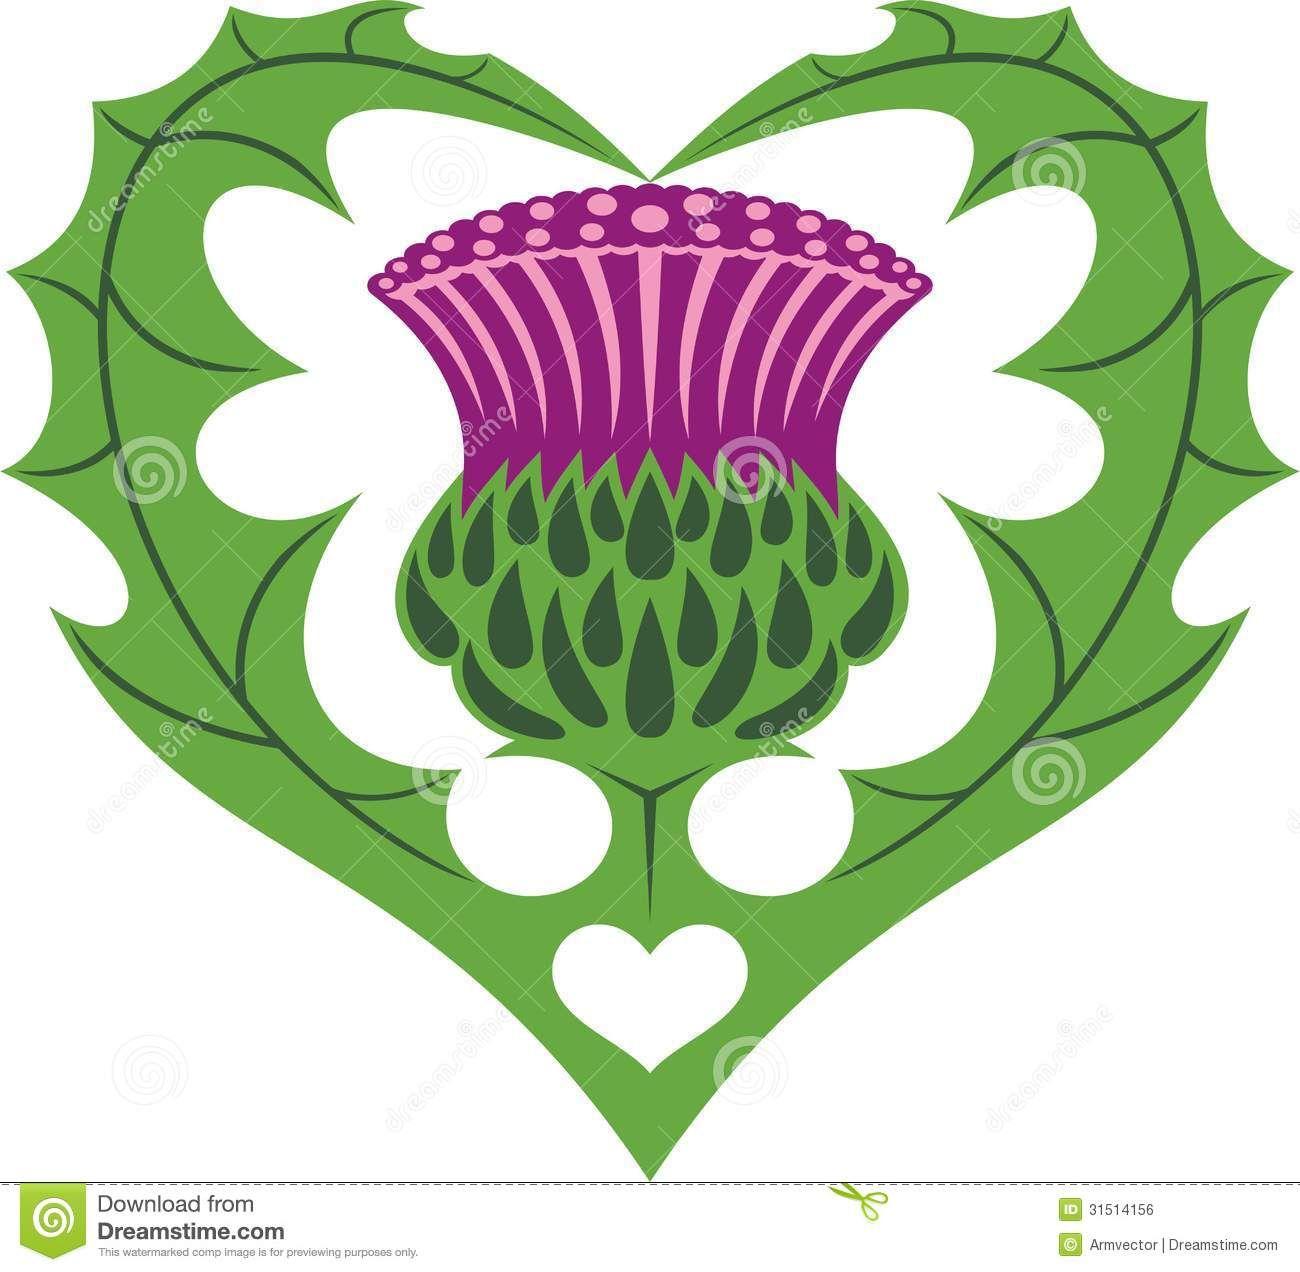 Scottish Heart Thistle Tattoo Royalty Free Stock Image Image